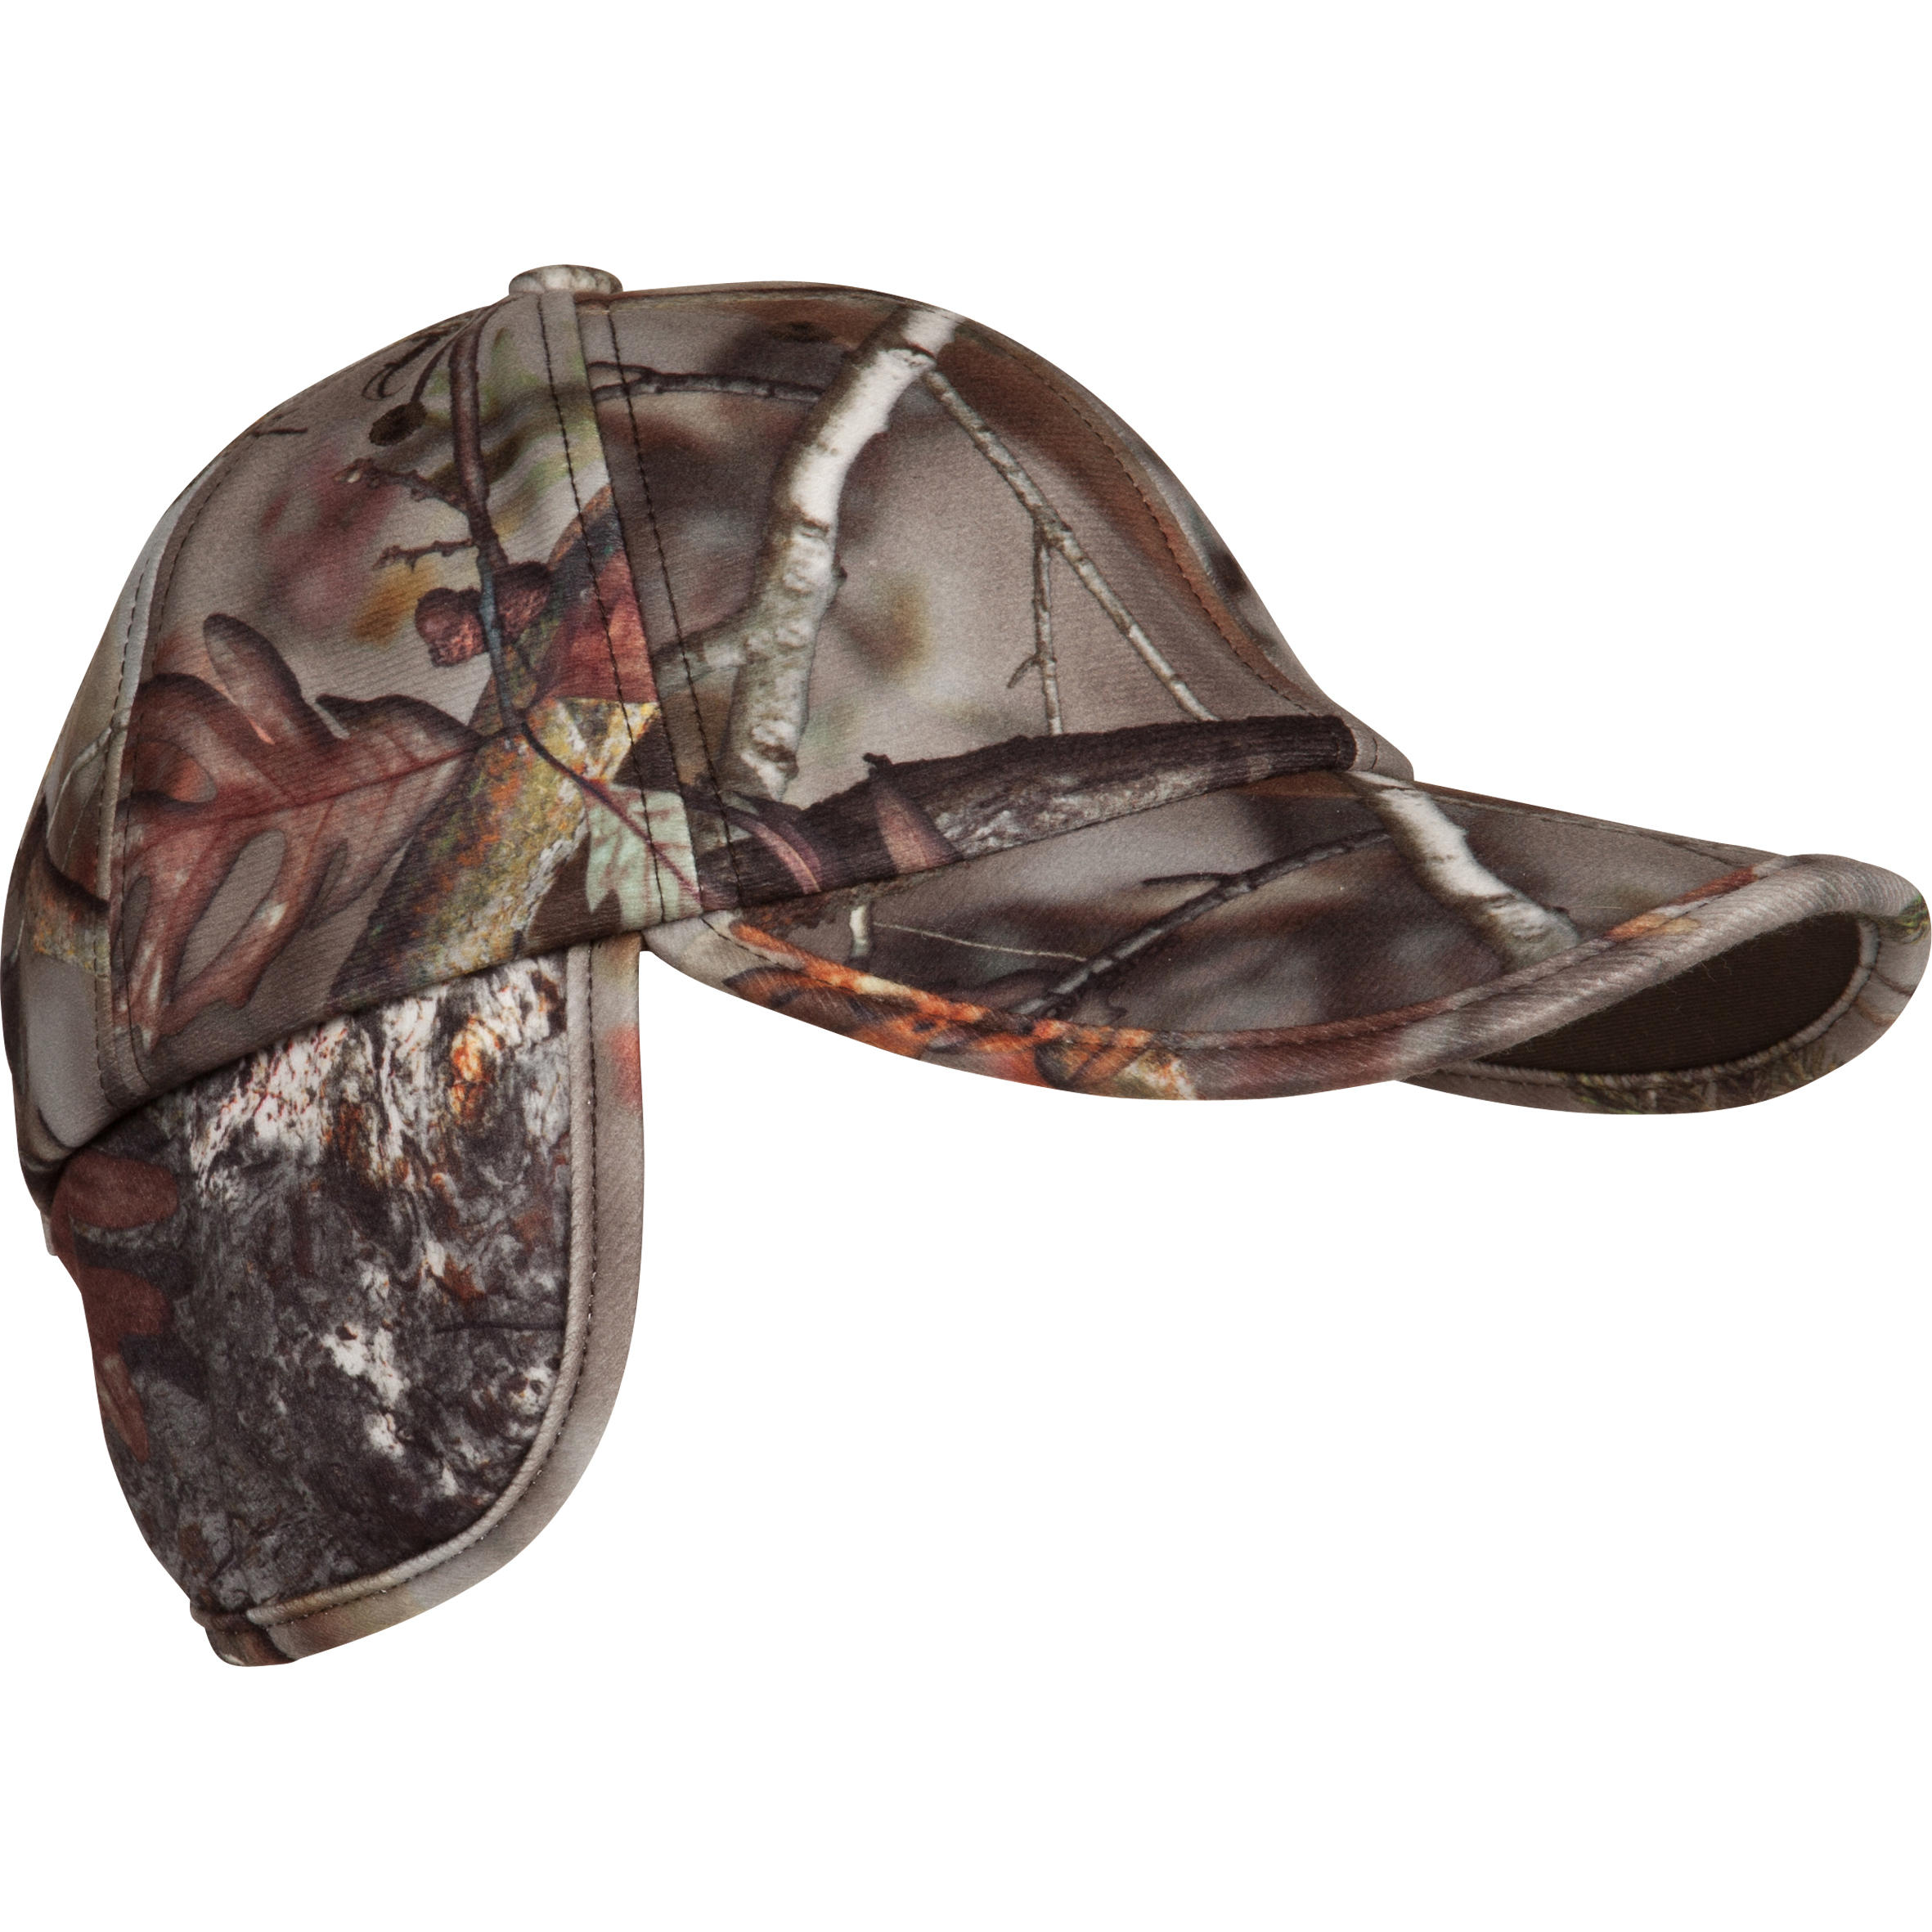 ACTIKAM-B ear flap cap camouflage